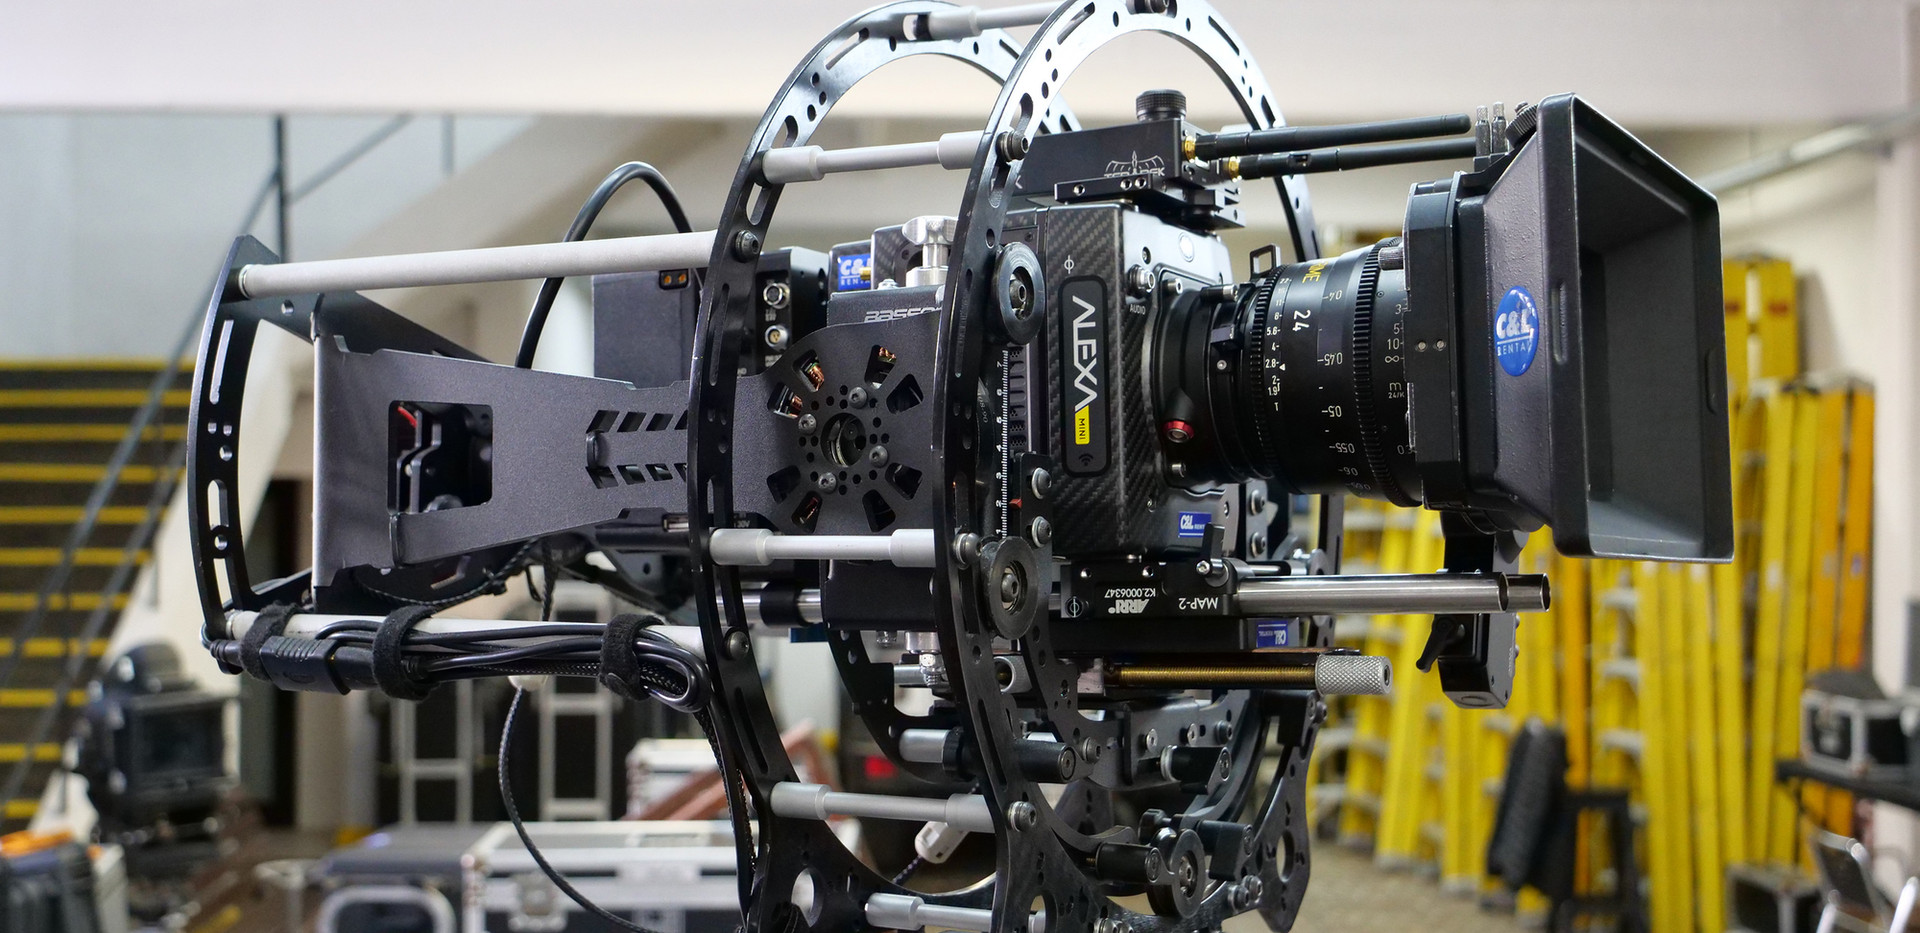 carbon fiber Arri alexa mini on hybrid steadycam Endless 3 Basson Steady camera stabilizer